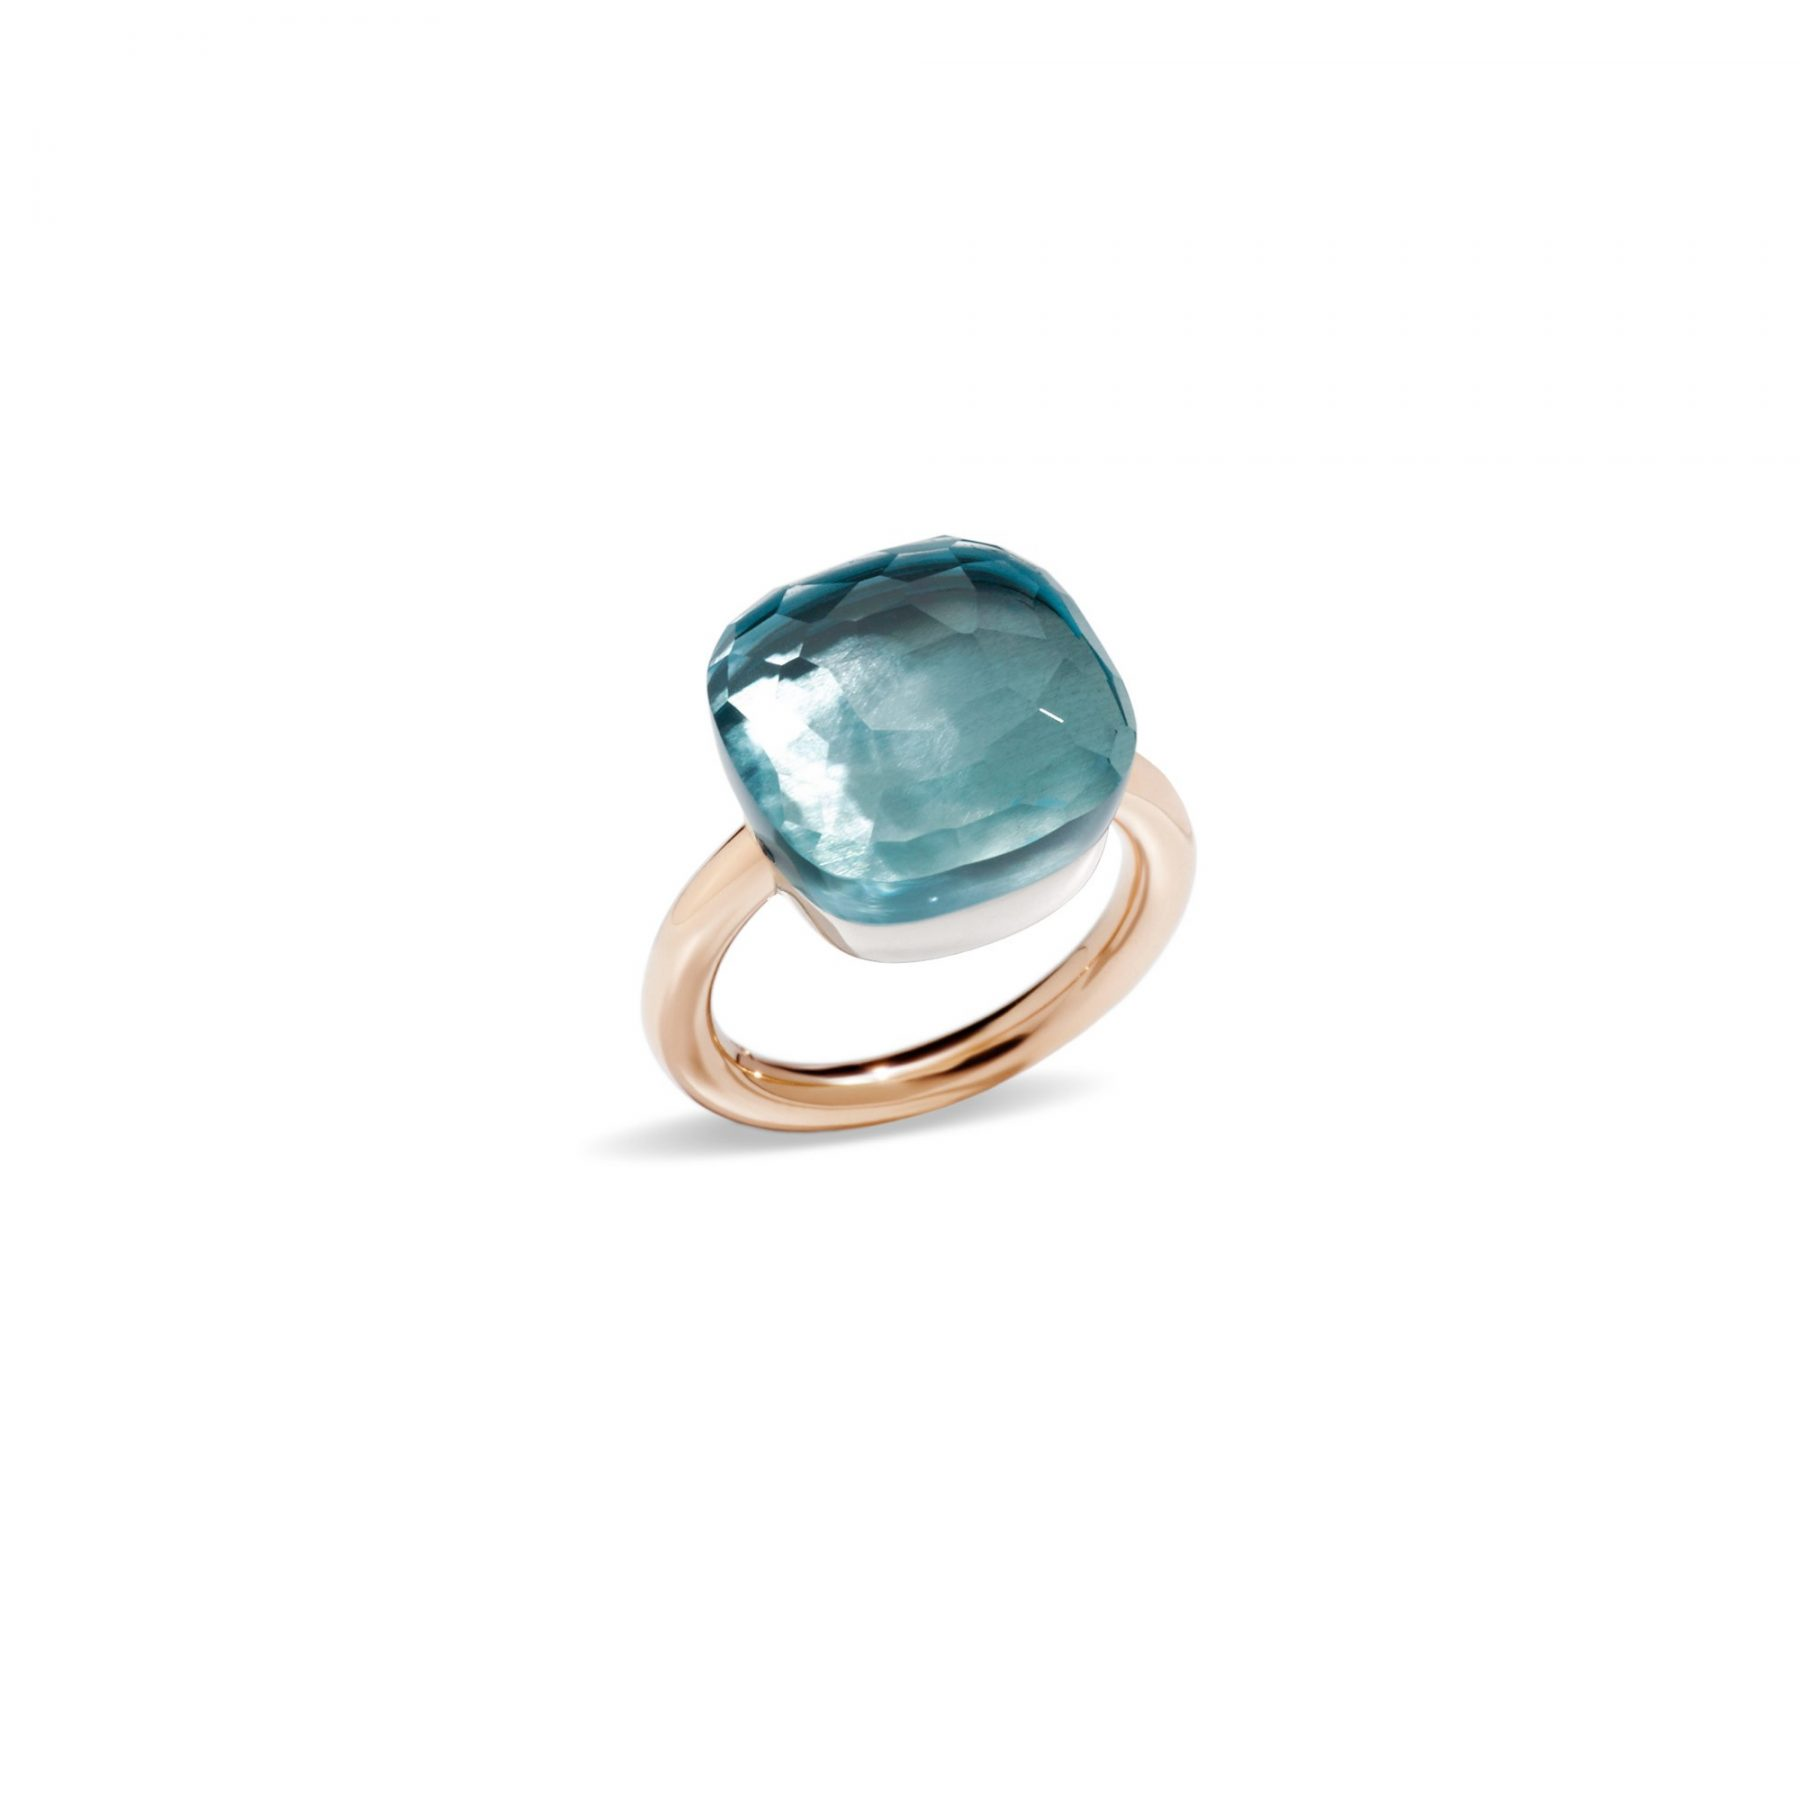 Ring Nudo Assoluto Topas blau - Pomellato - A.B704MO6/OY